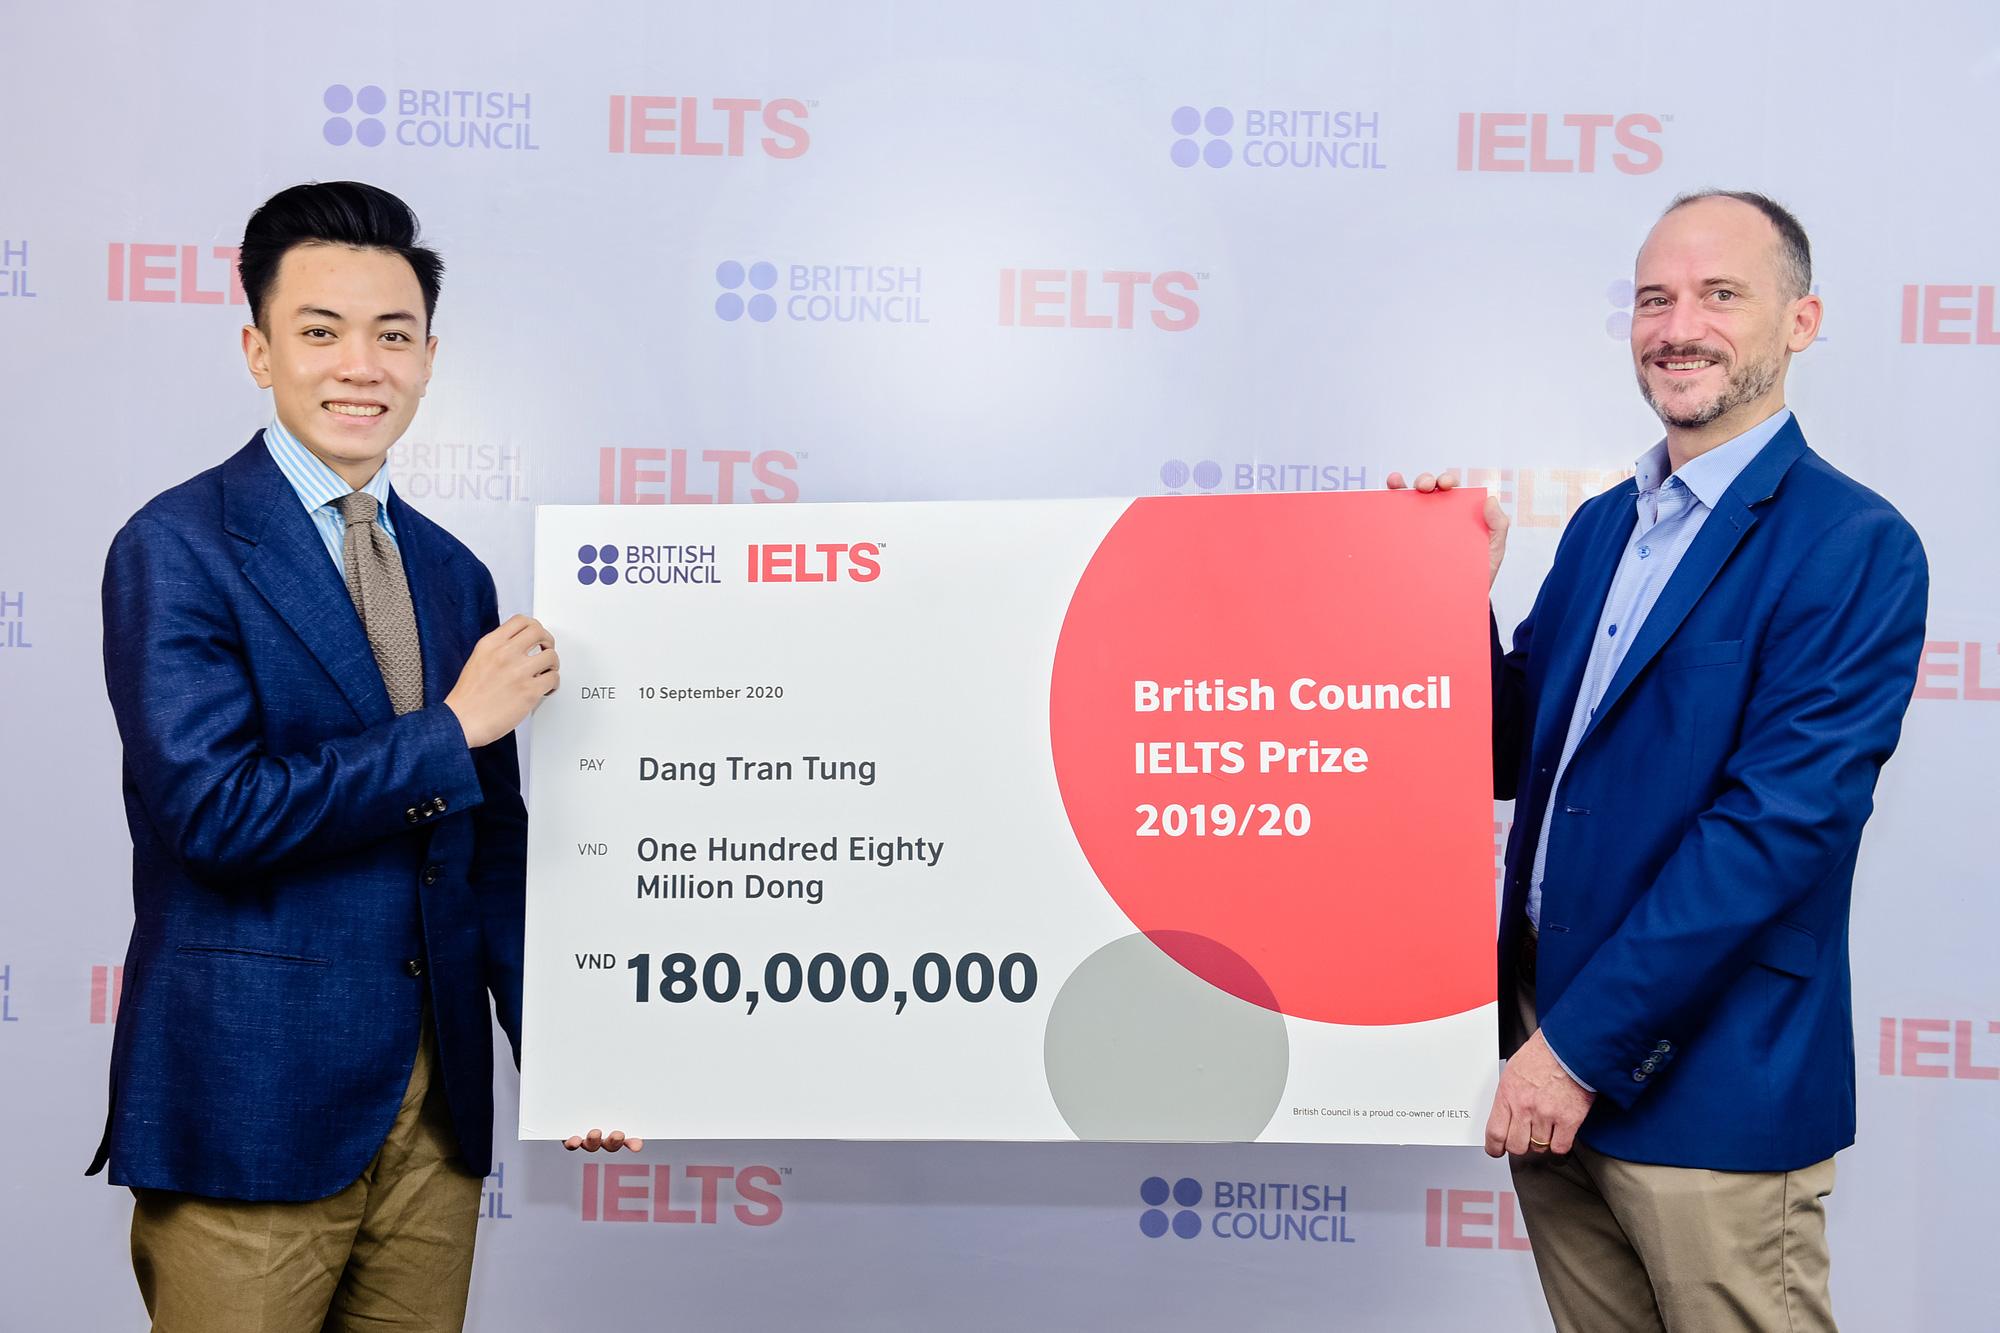 Three Vietnamese among IELTS Prize winners of 2019-20